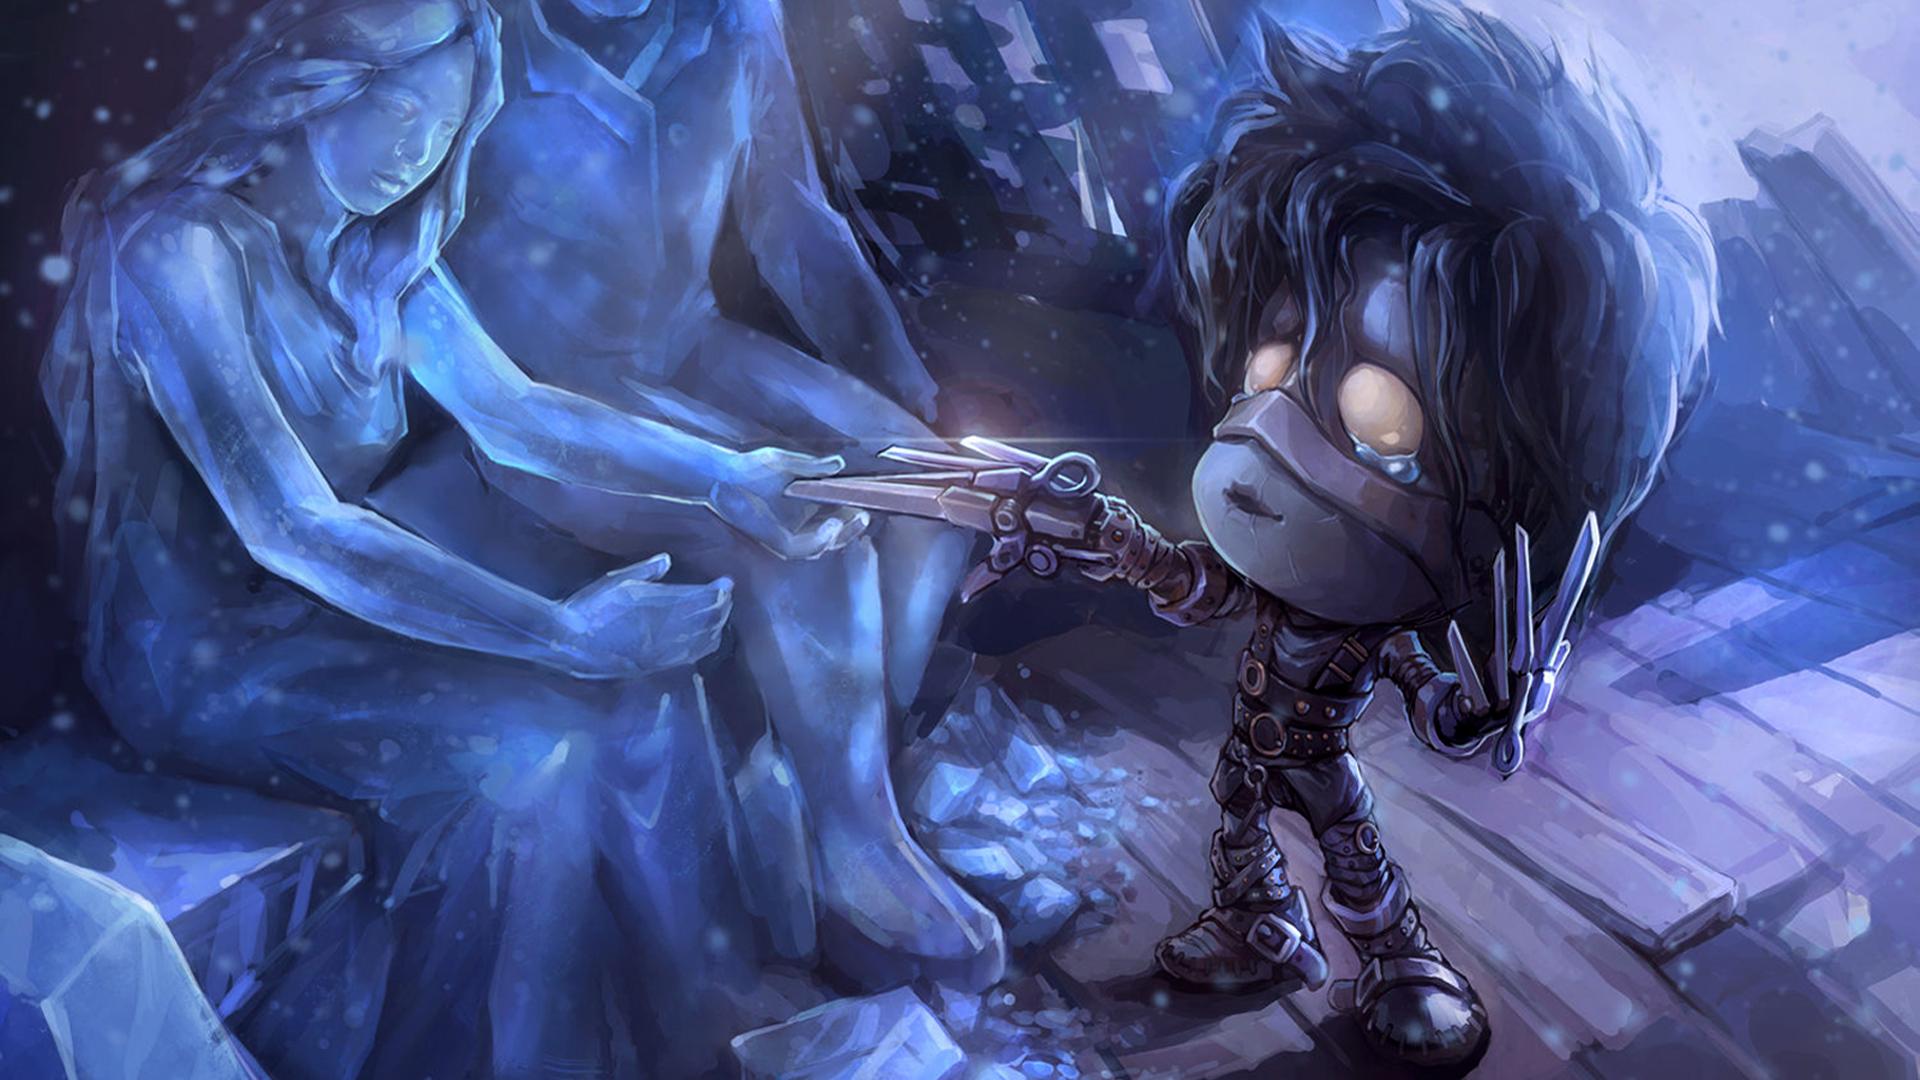 47 Amumu League Of Legends HD Wallpapers  Background